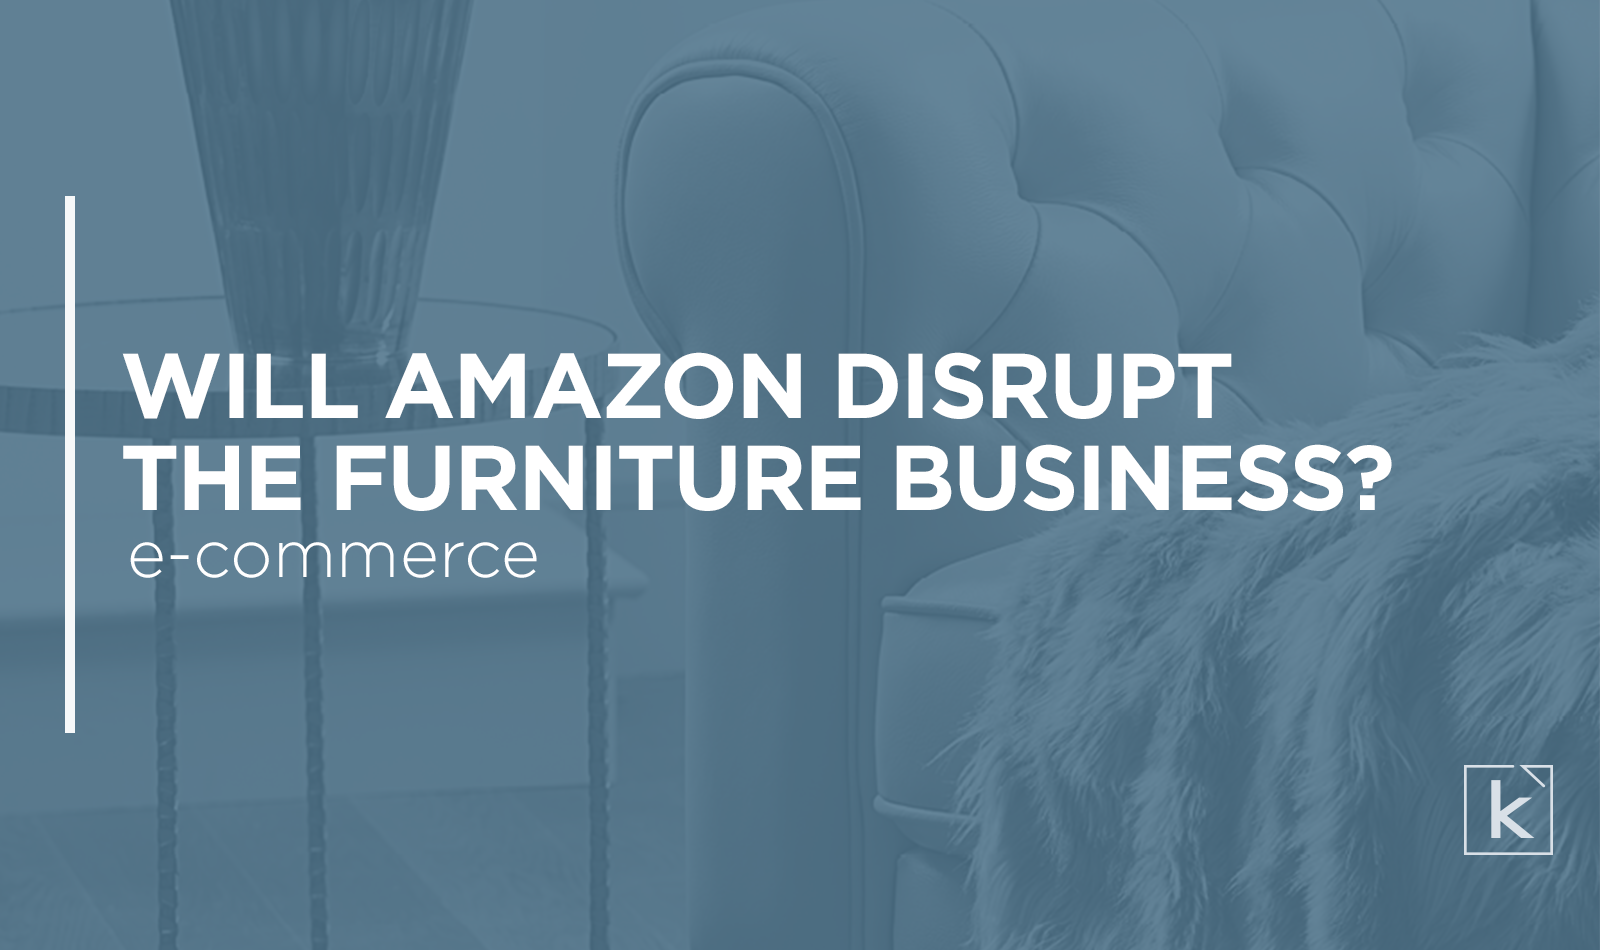 will-amazon-disrupt-furniture-business